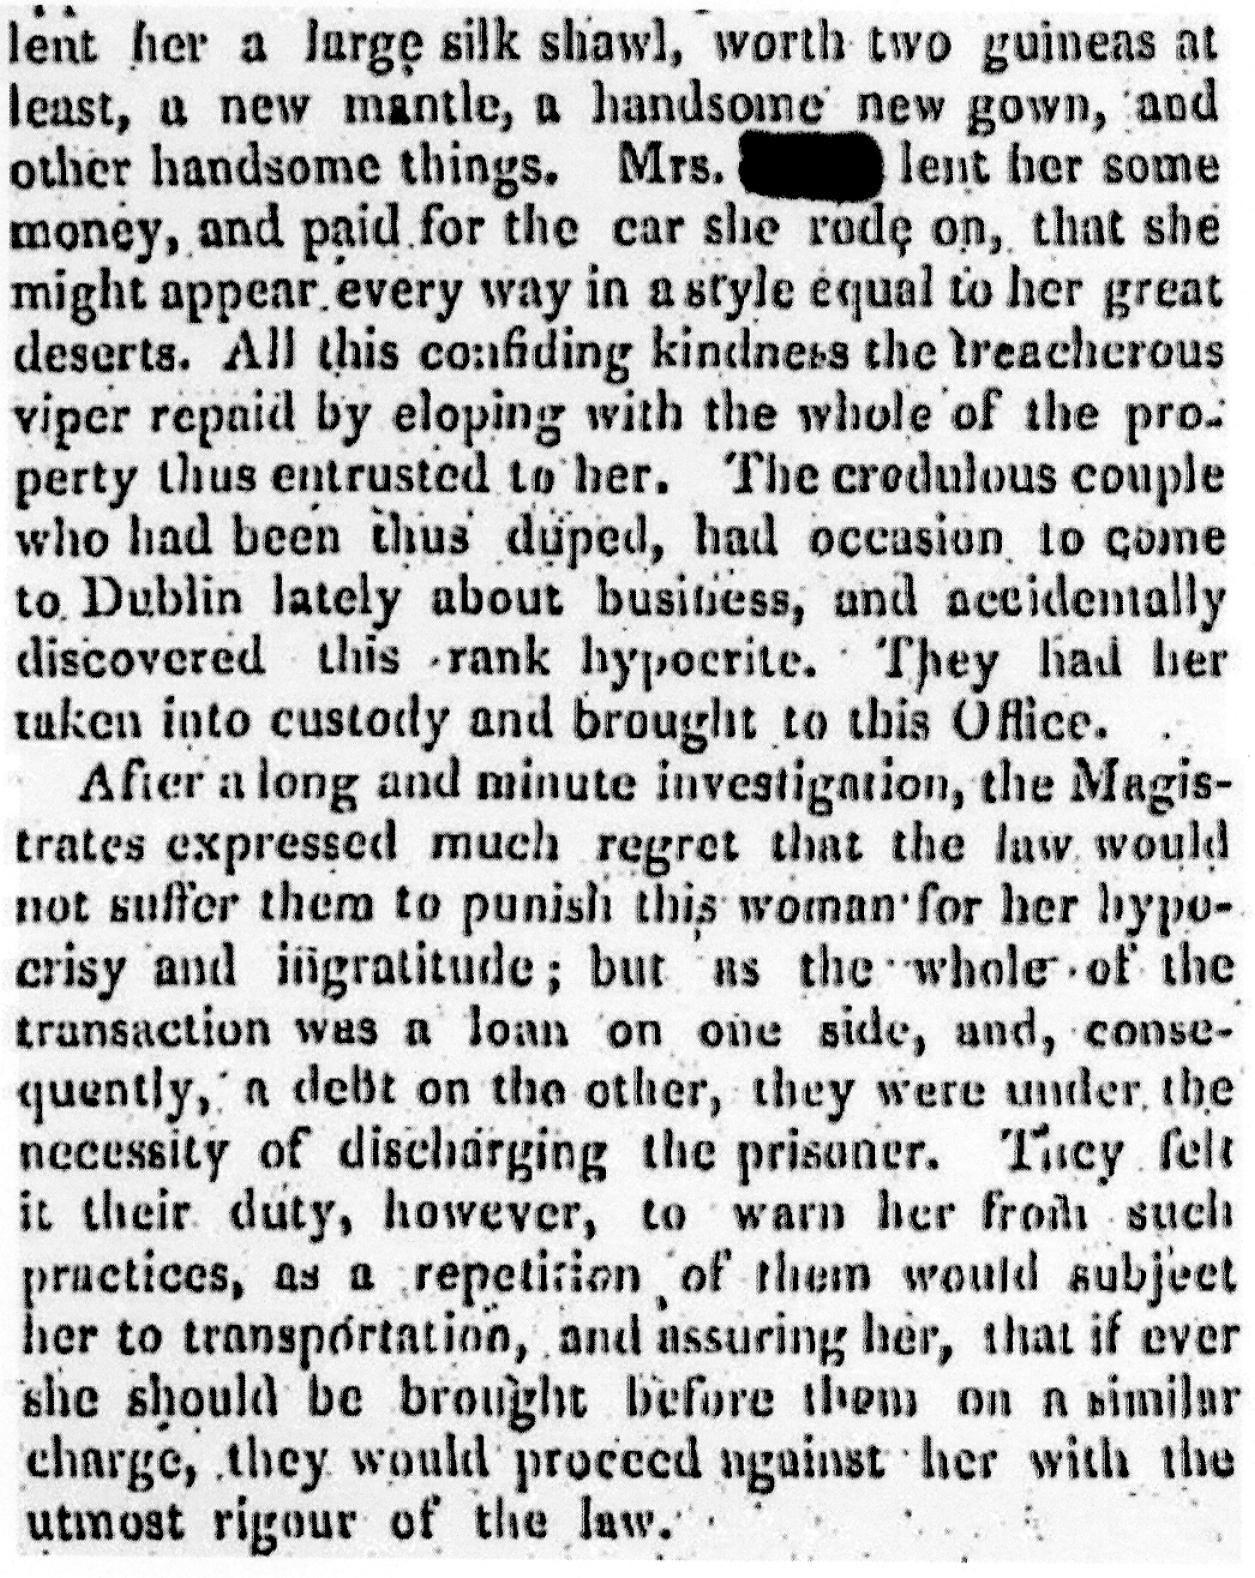 FMJ 5 Feb 1819b